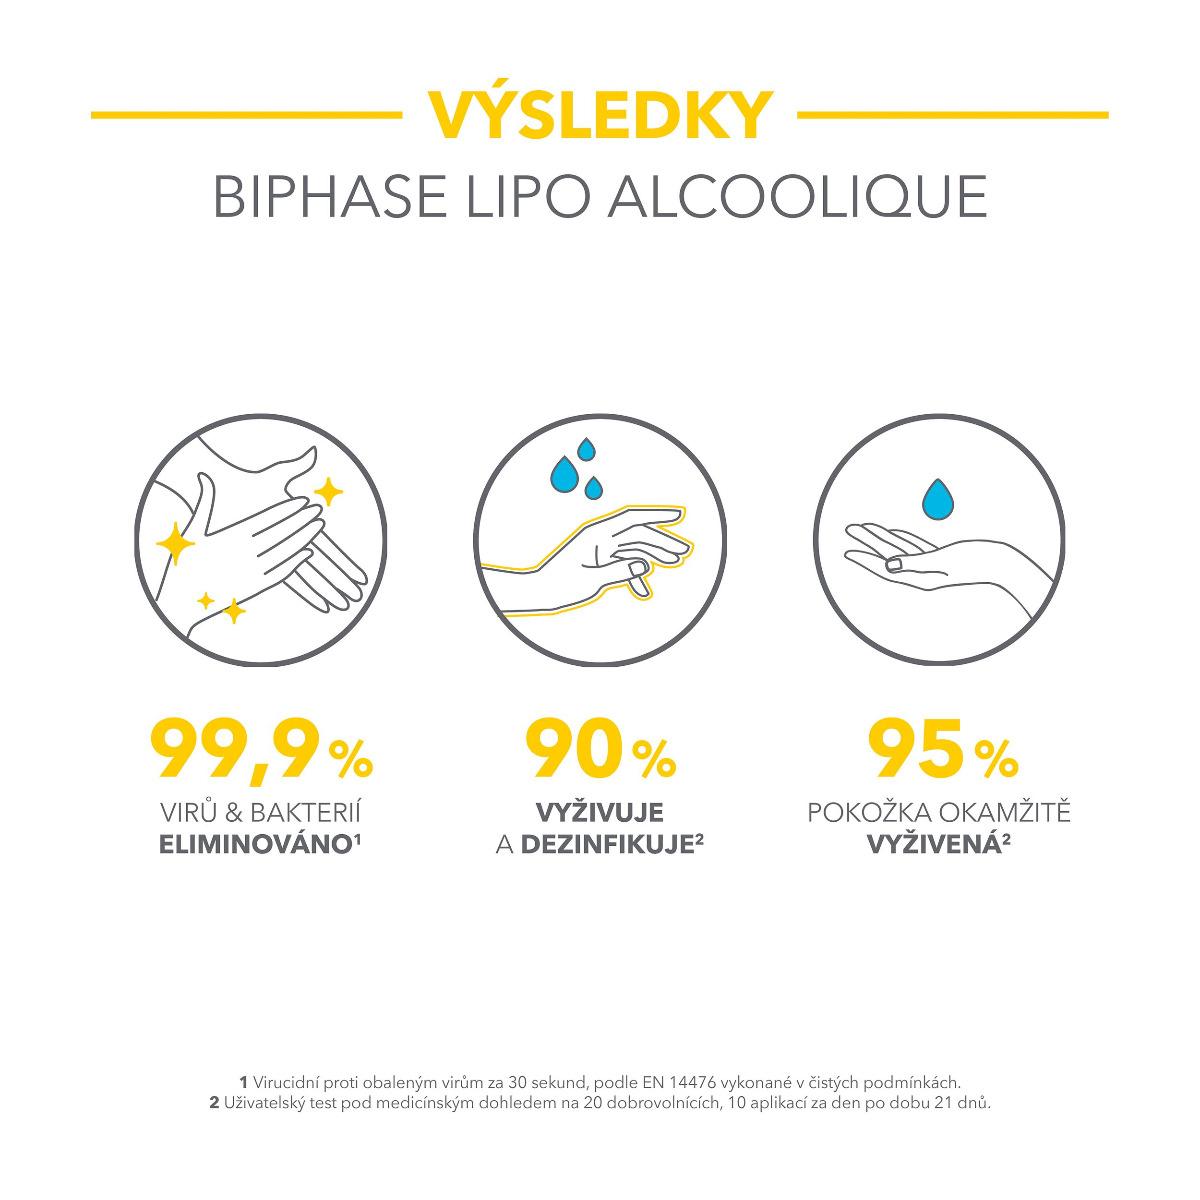 BIODERMA Biphase Lipo alcoolique 100 ml2